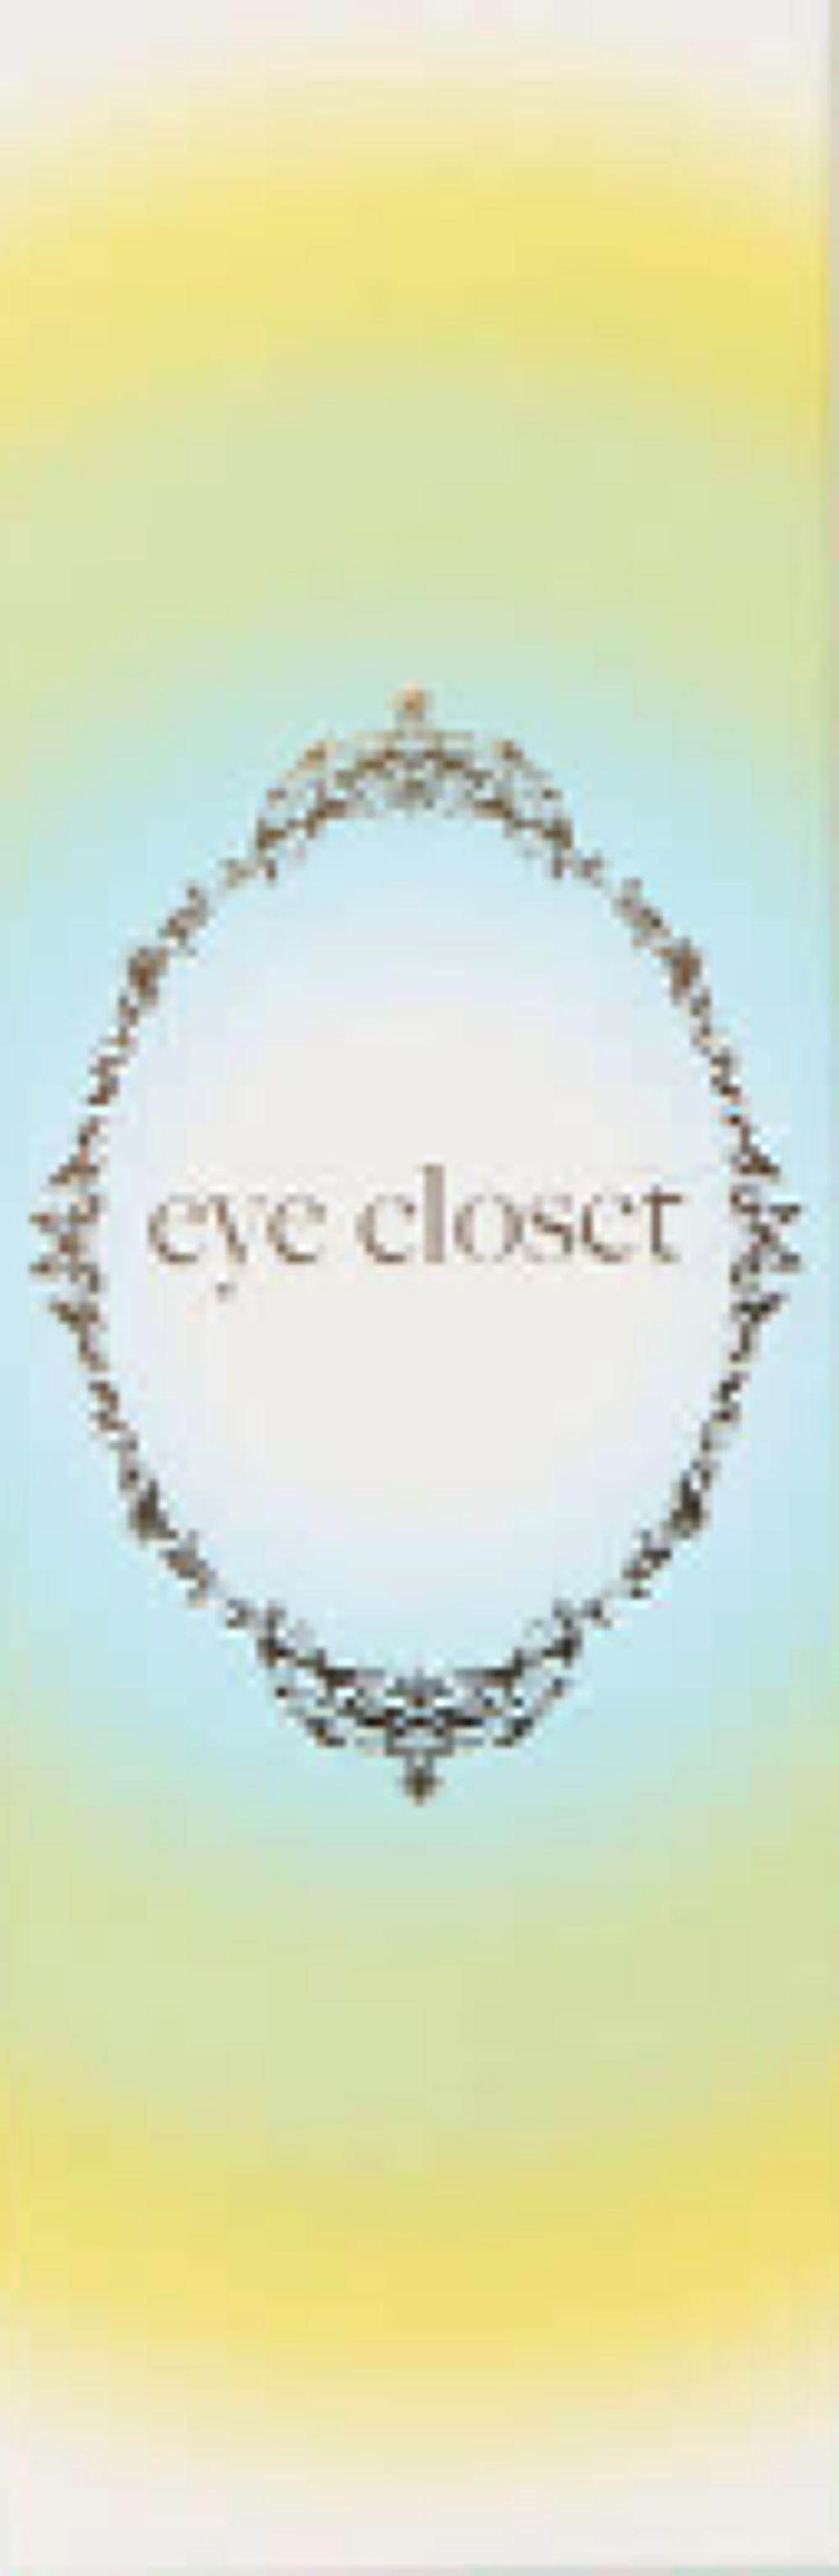 eye closet 1DAY(アイクローゼット ワンデー) EYE CLOSET